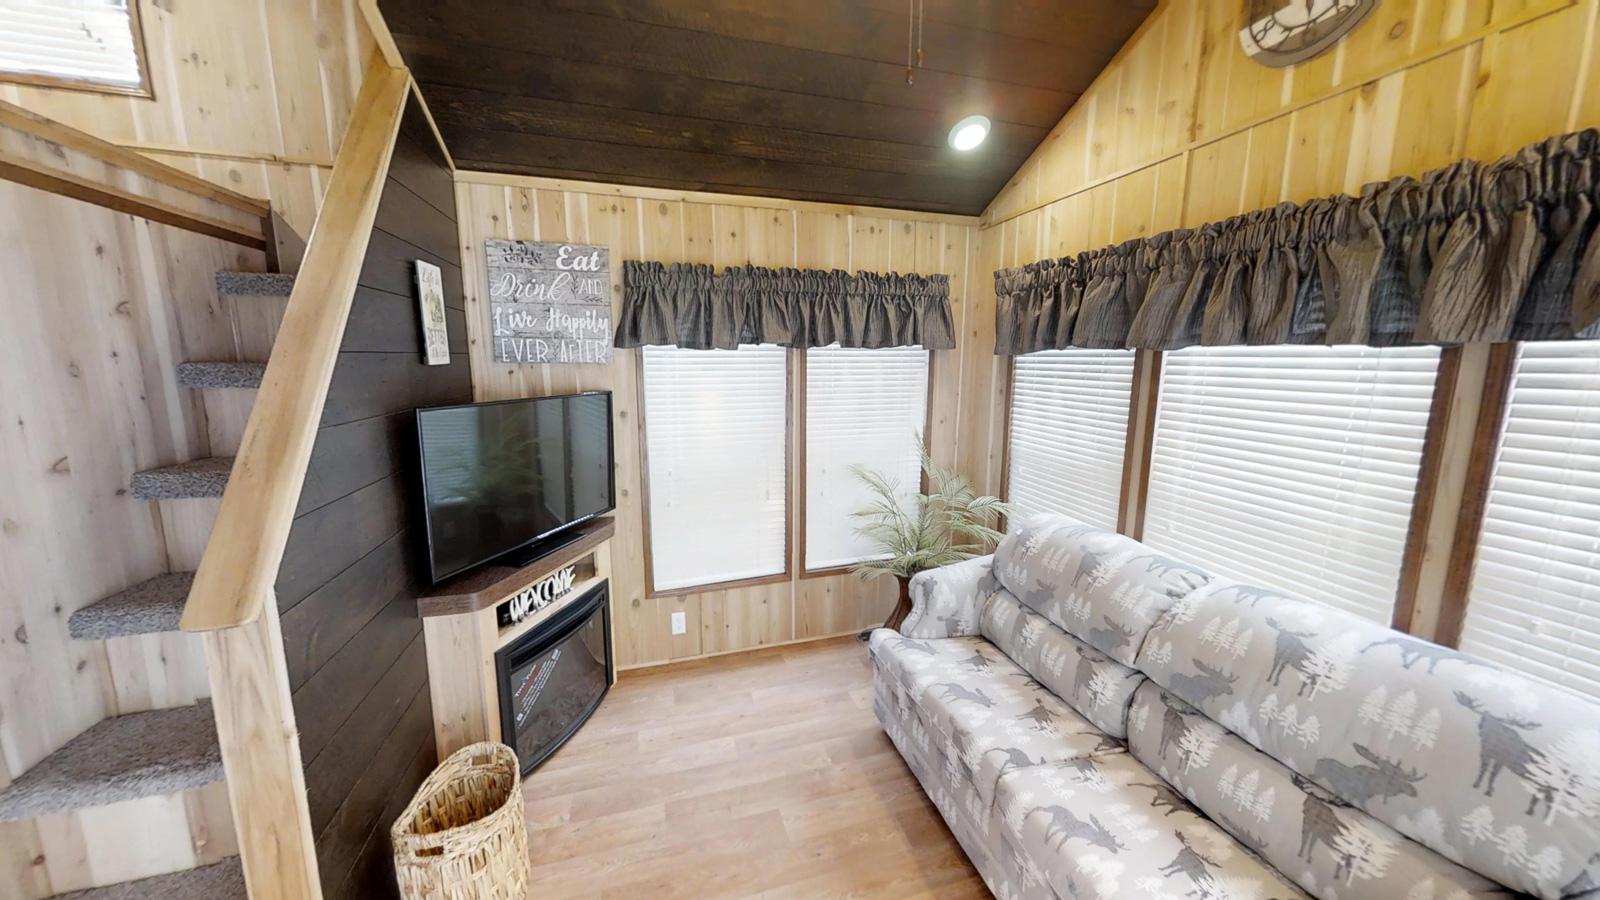 Americas-Park-Cabins-Lodge-Series-39-ND-10052018_095556